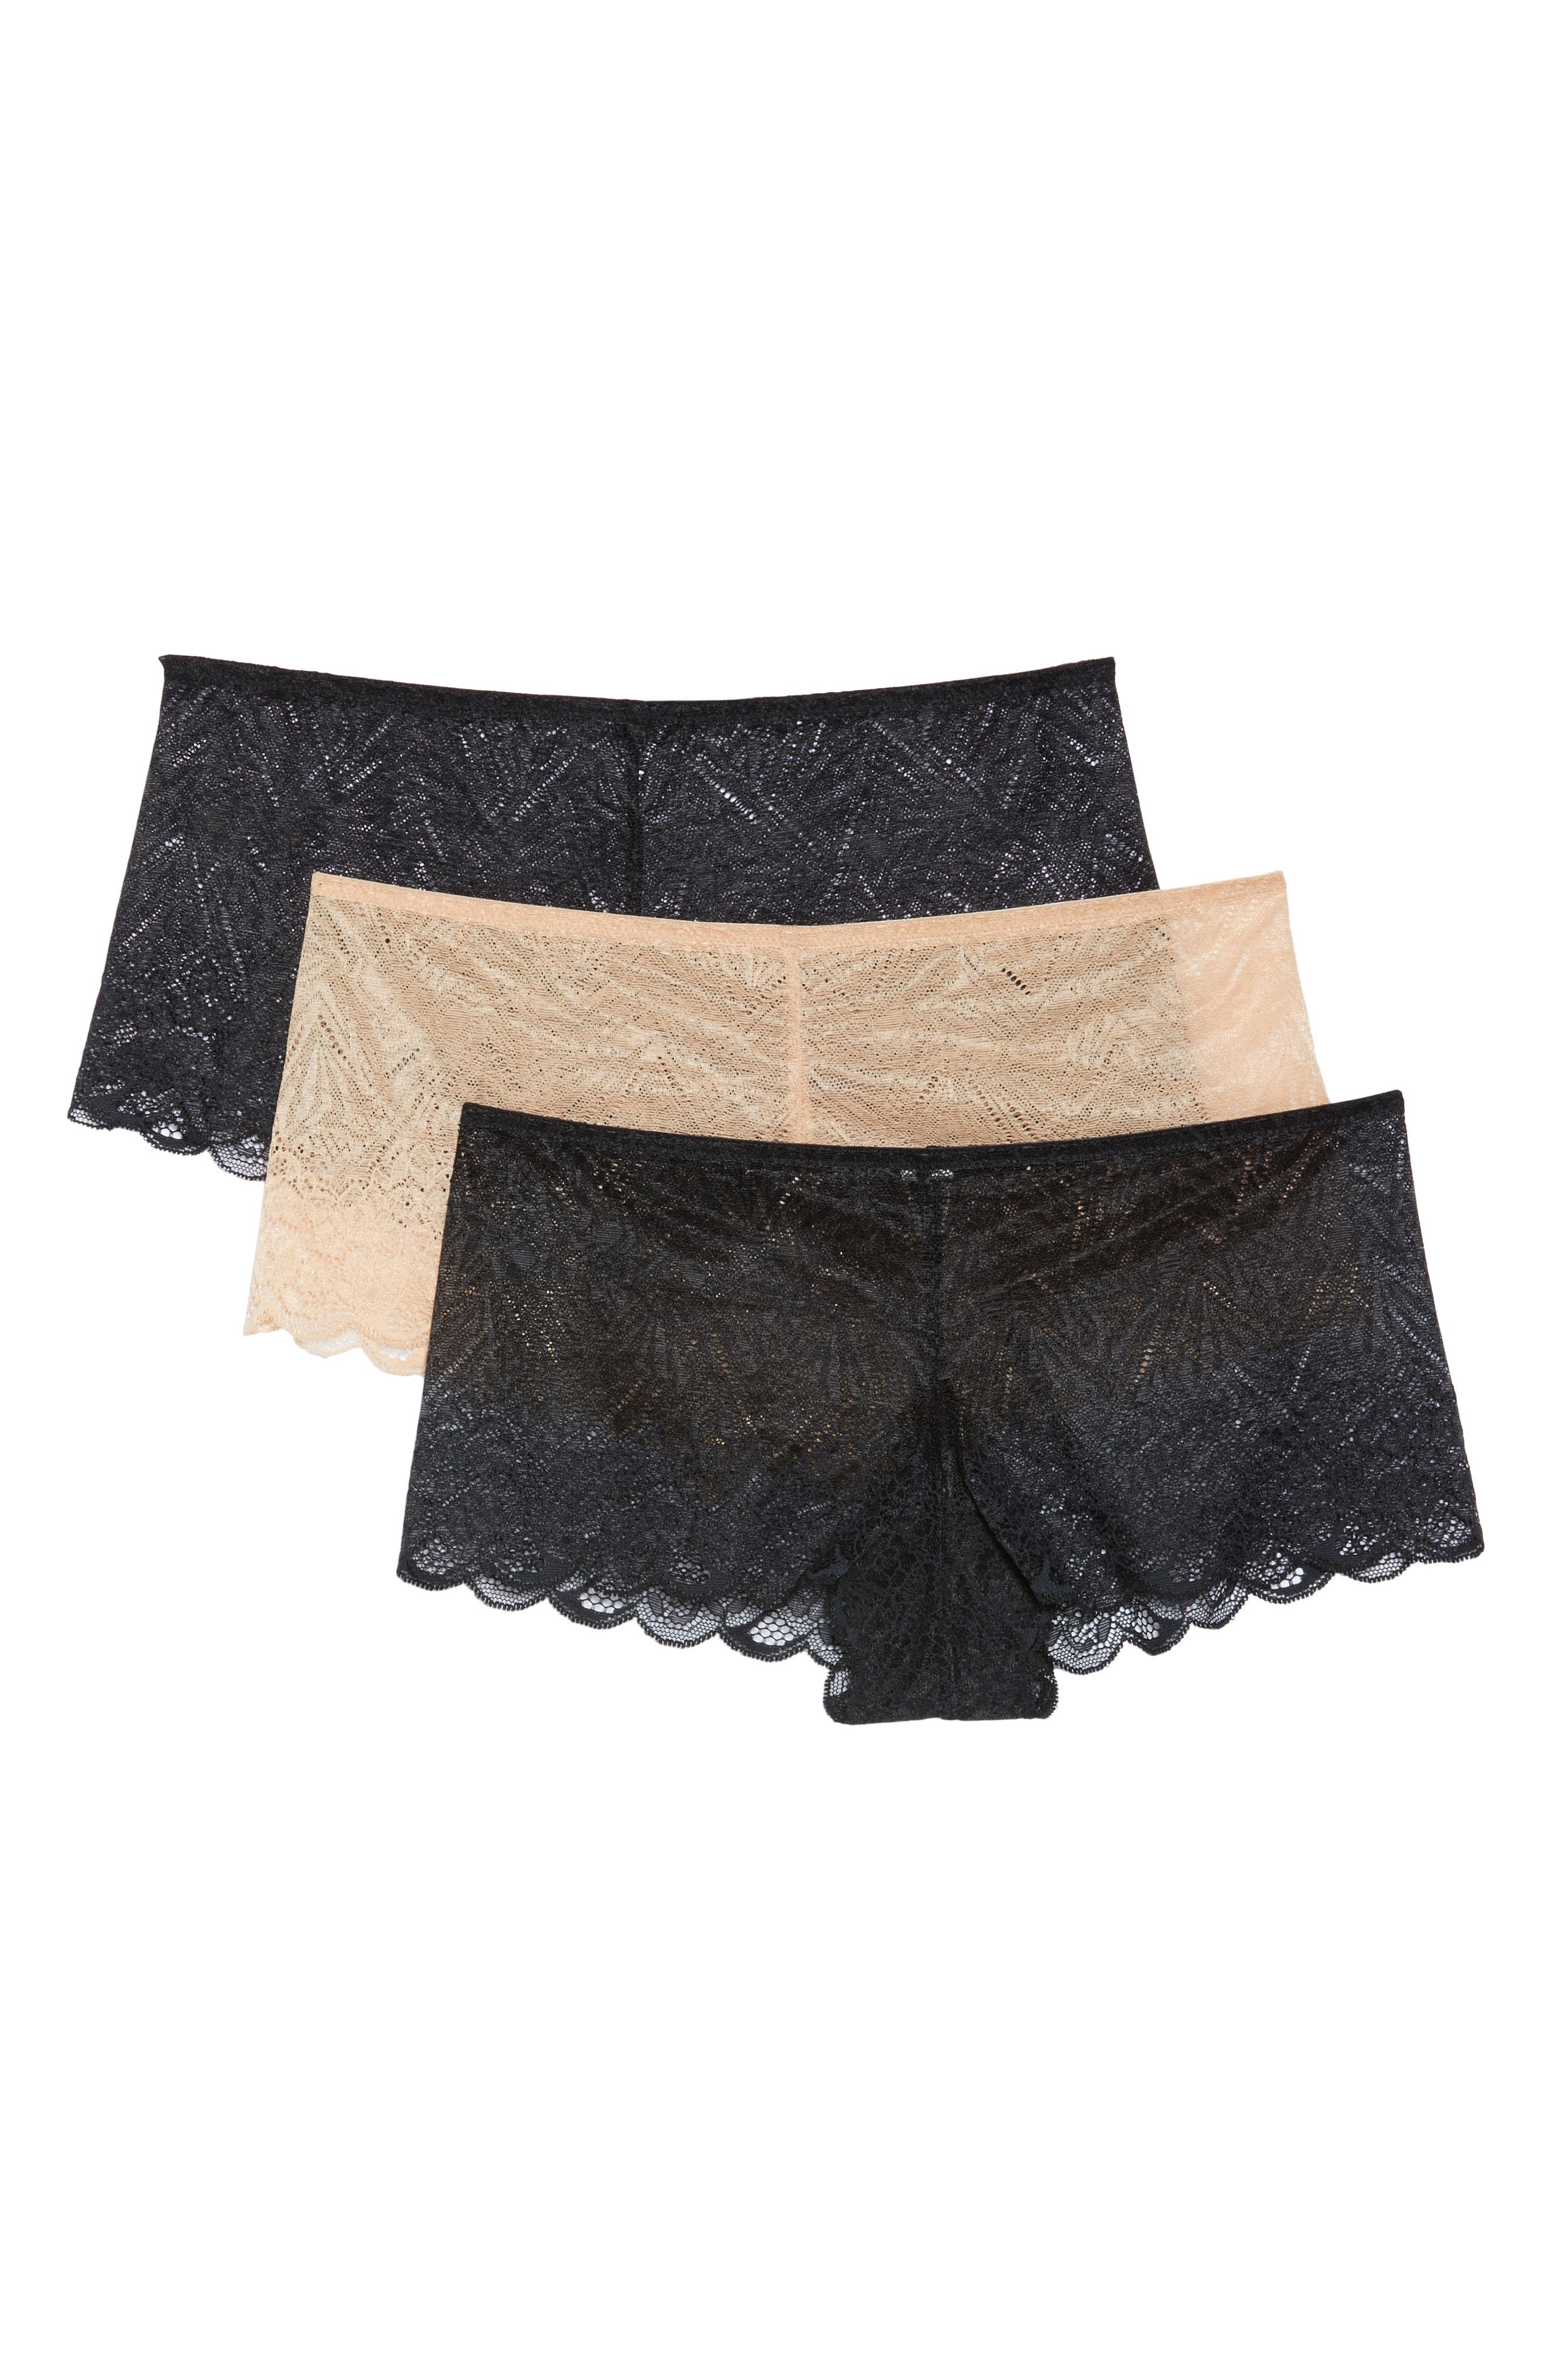 3-Pack Lace Boyshorts,                         Main,                         color, Black/ Black/ Beige